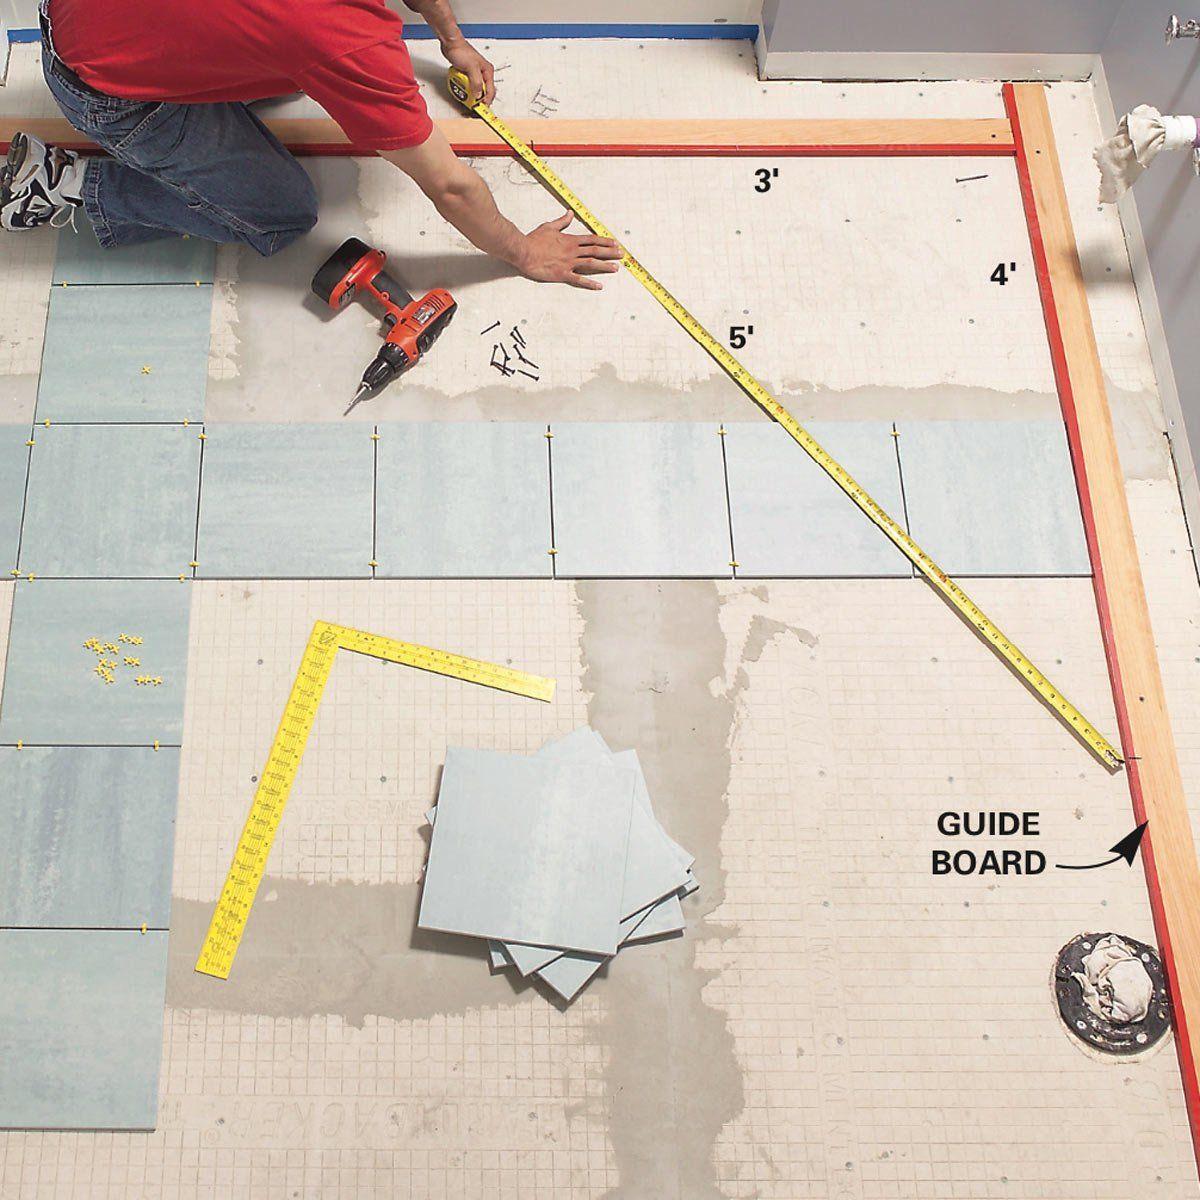 How To Lay Tile Install A Ceramic Tile Floor In The Bathroom The Family Handyman Ceramic Floor Tiles How To Lay Tile Tile Floor